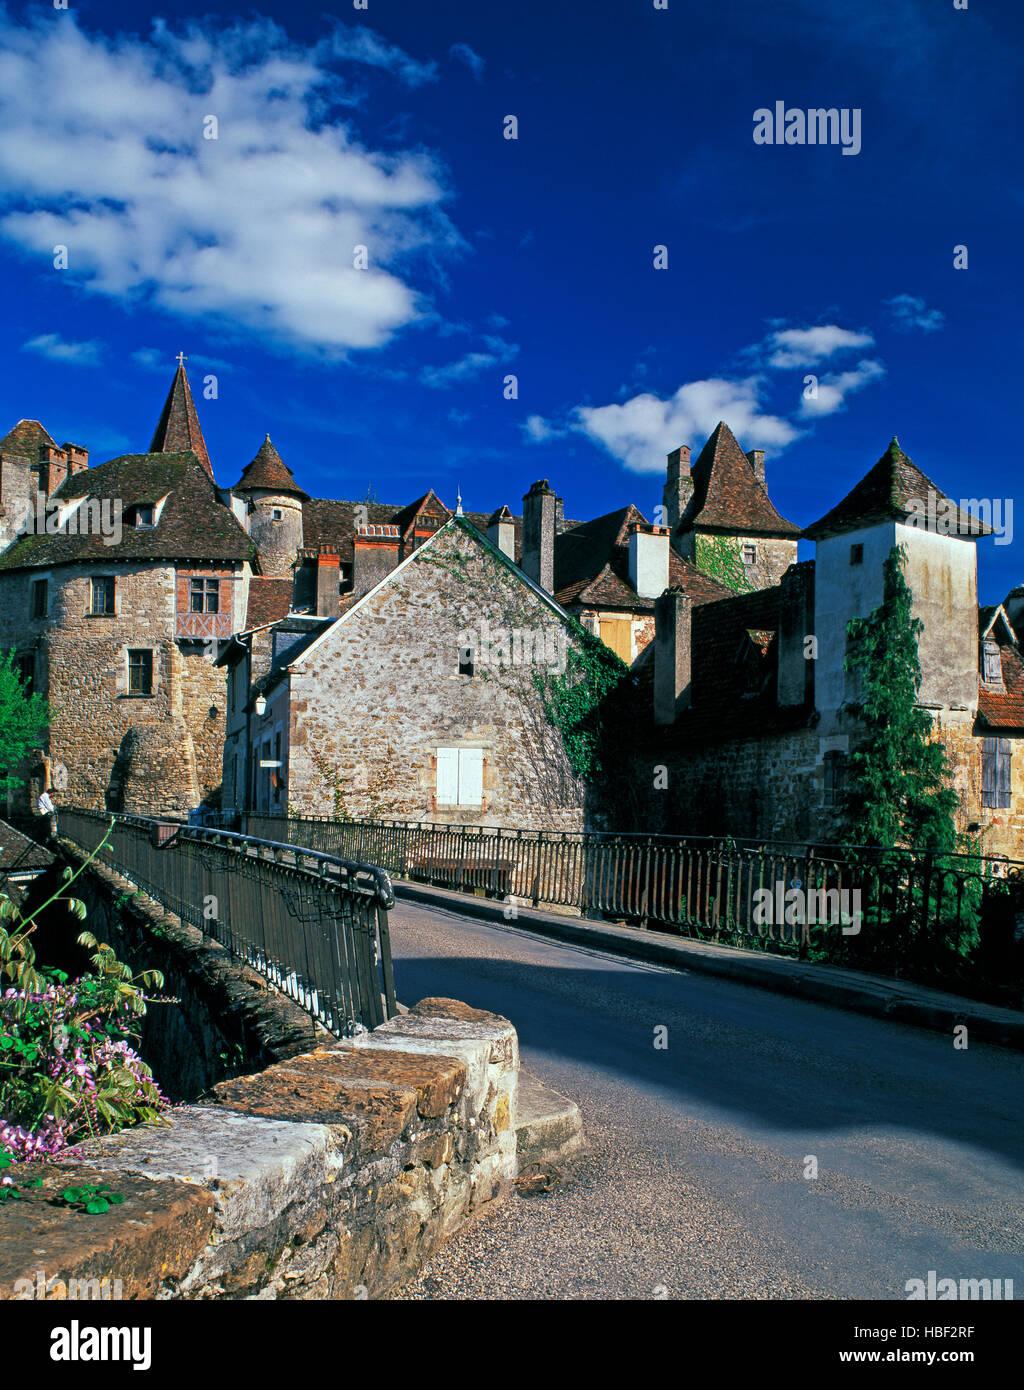 Carrenac village, Lot Province, Midi Pyrenees, France - Stock Image